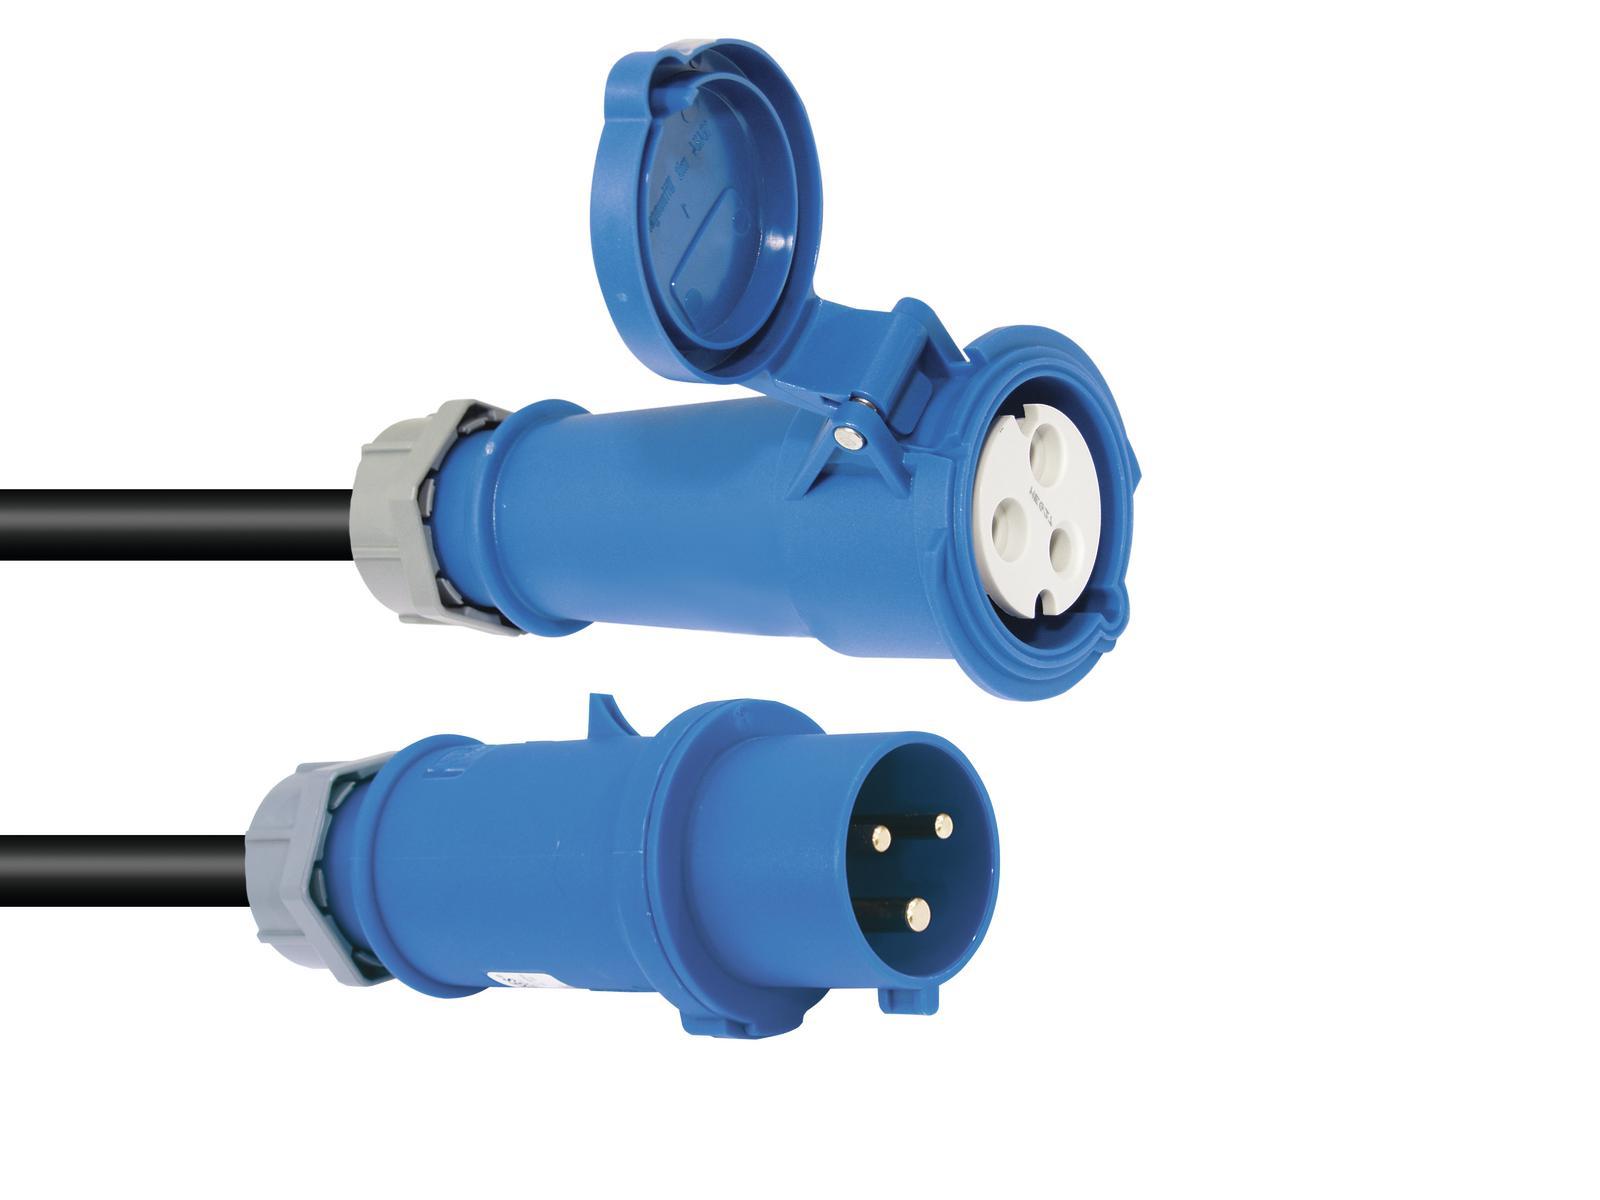 Extension PSSO CEE 32A 3x6,0 mm 5MT blue